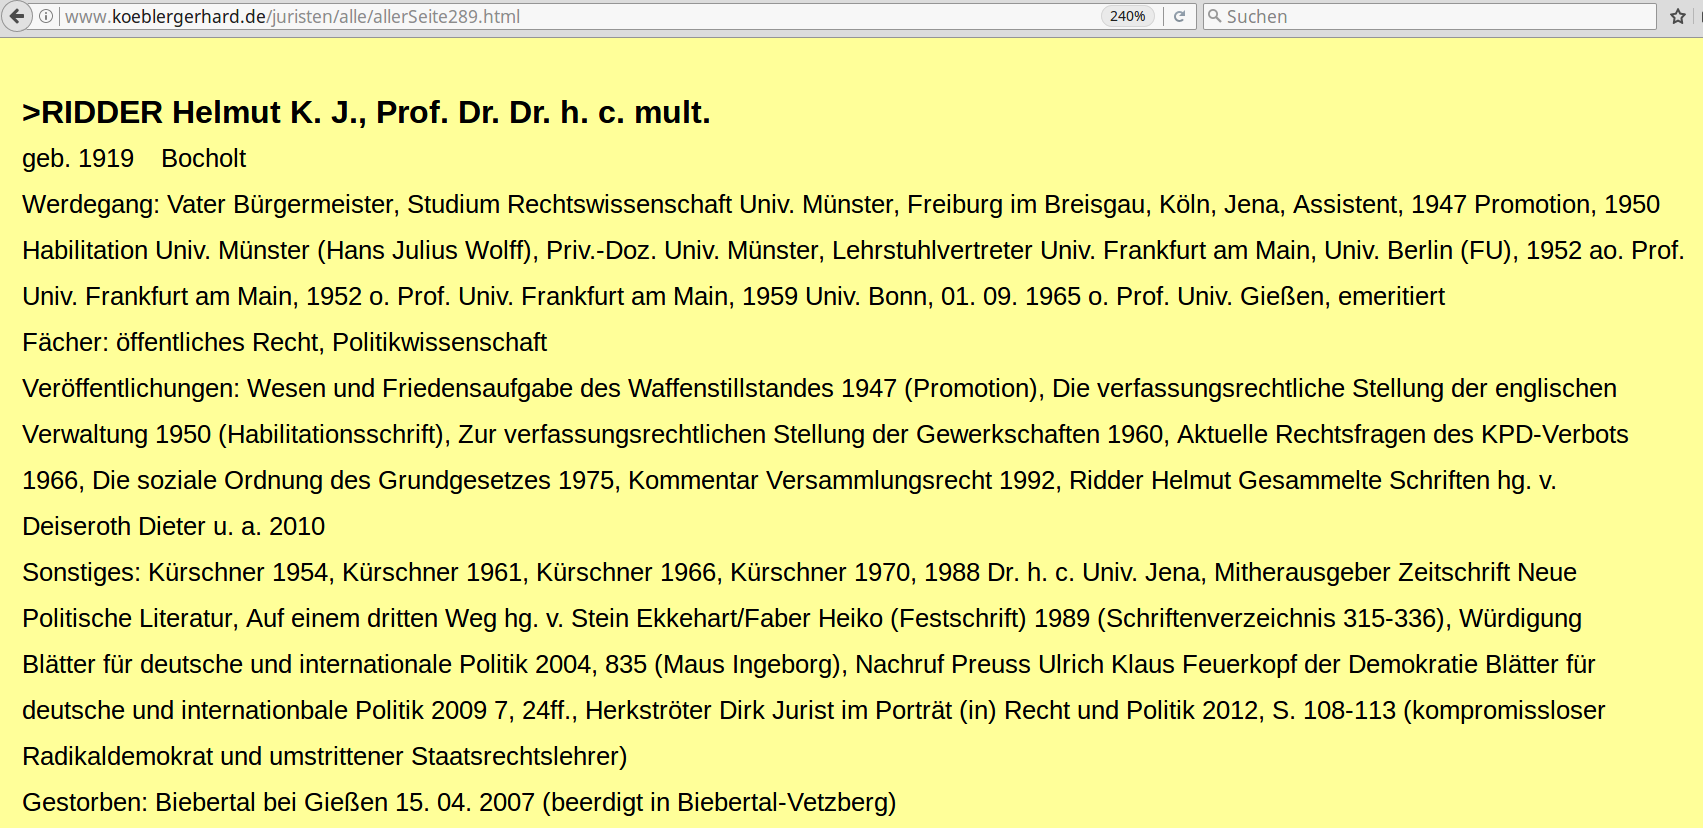 http://www.koeblergerhard.de/juristen/alle/allerSeite289.html